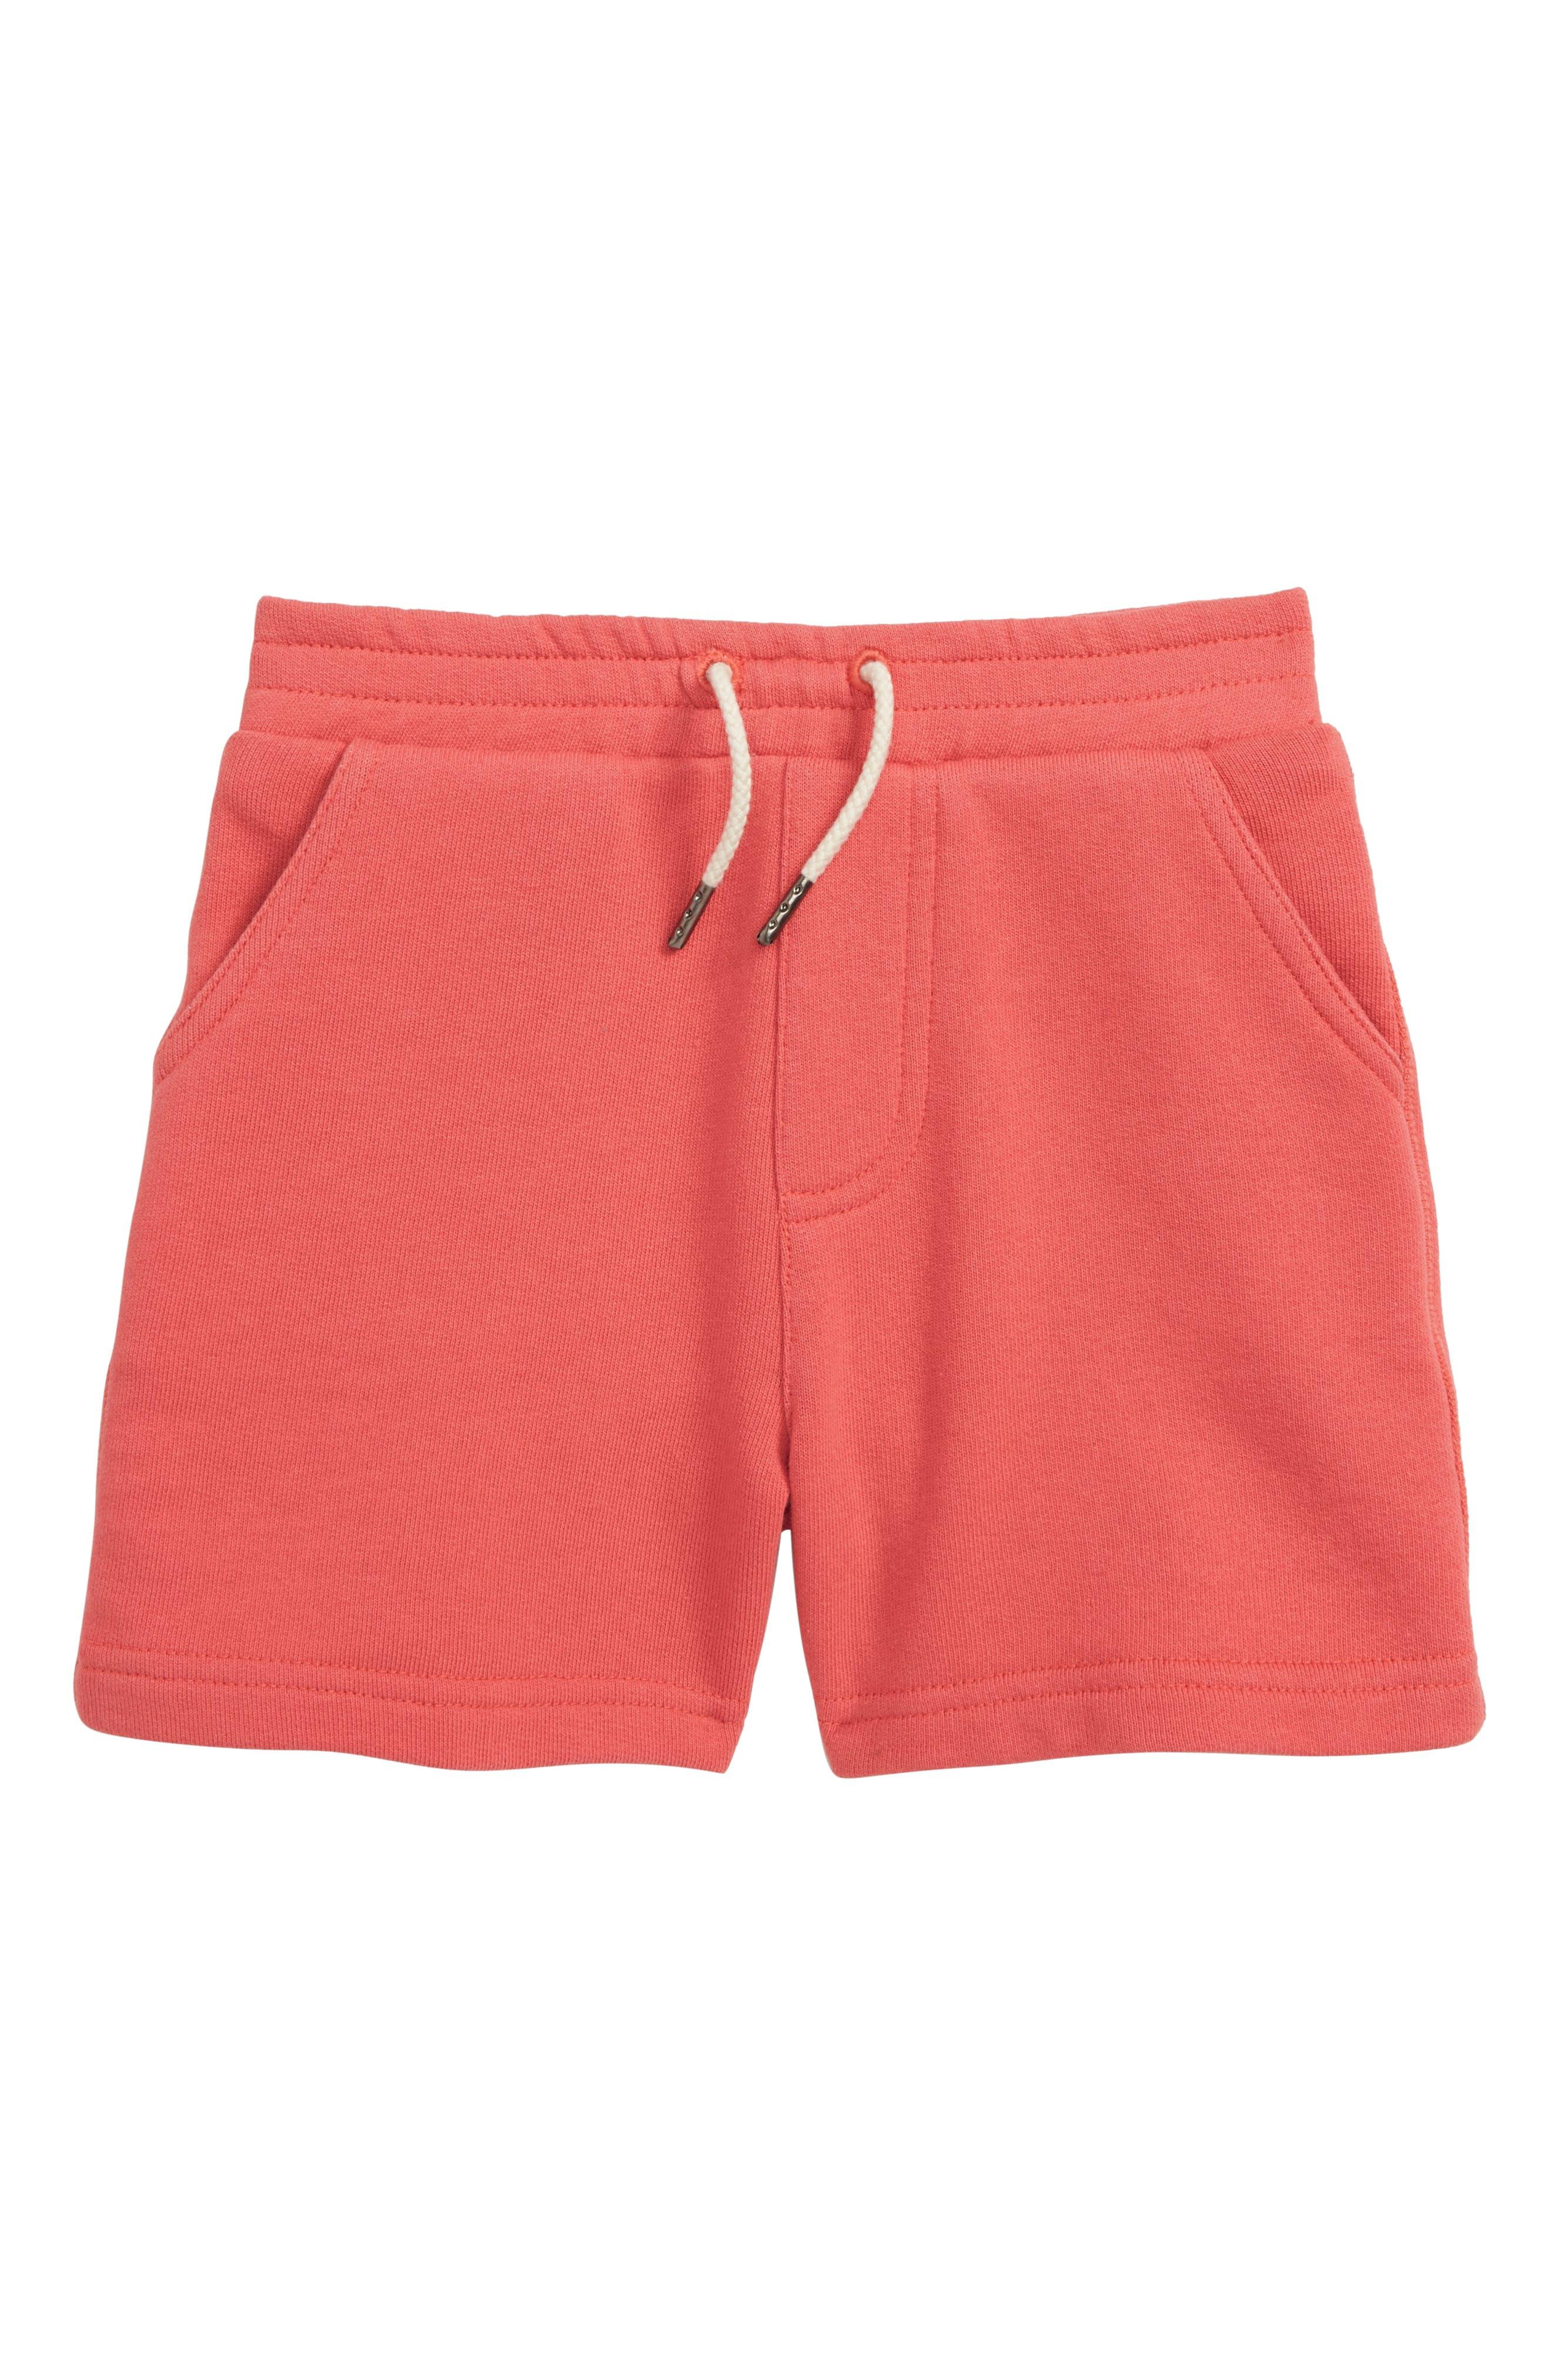 PEEK ESSENTIALS Even Shorts, Main, color, RED